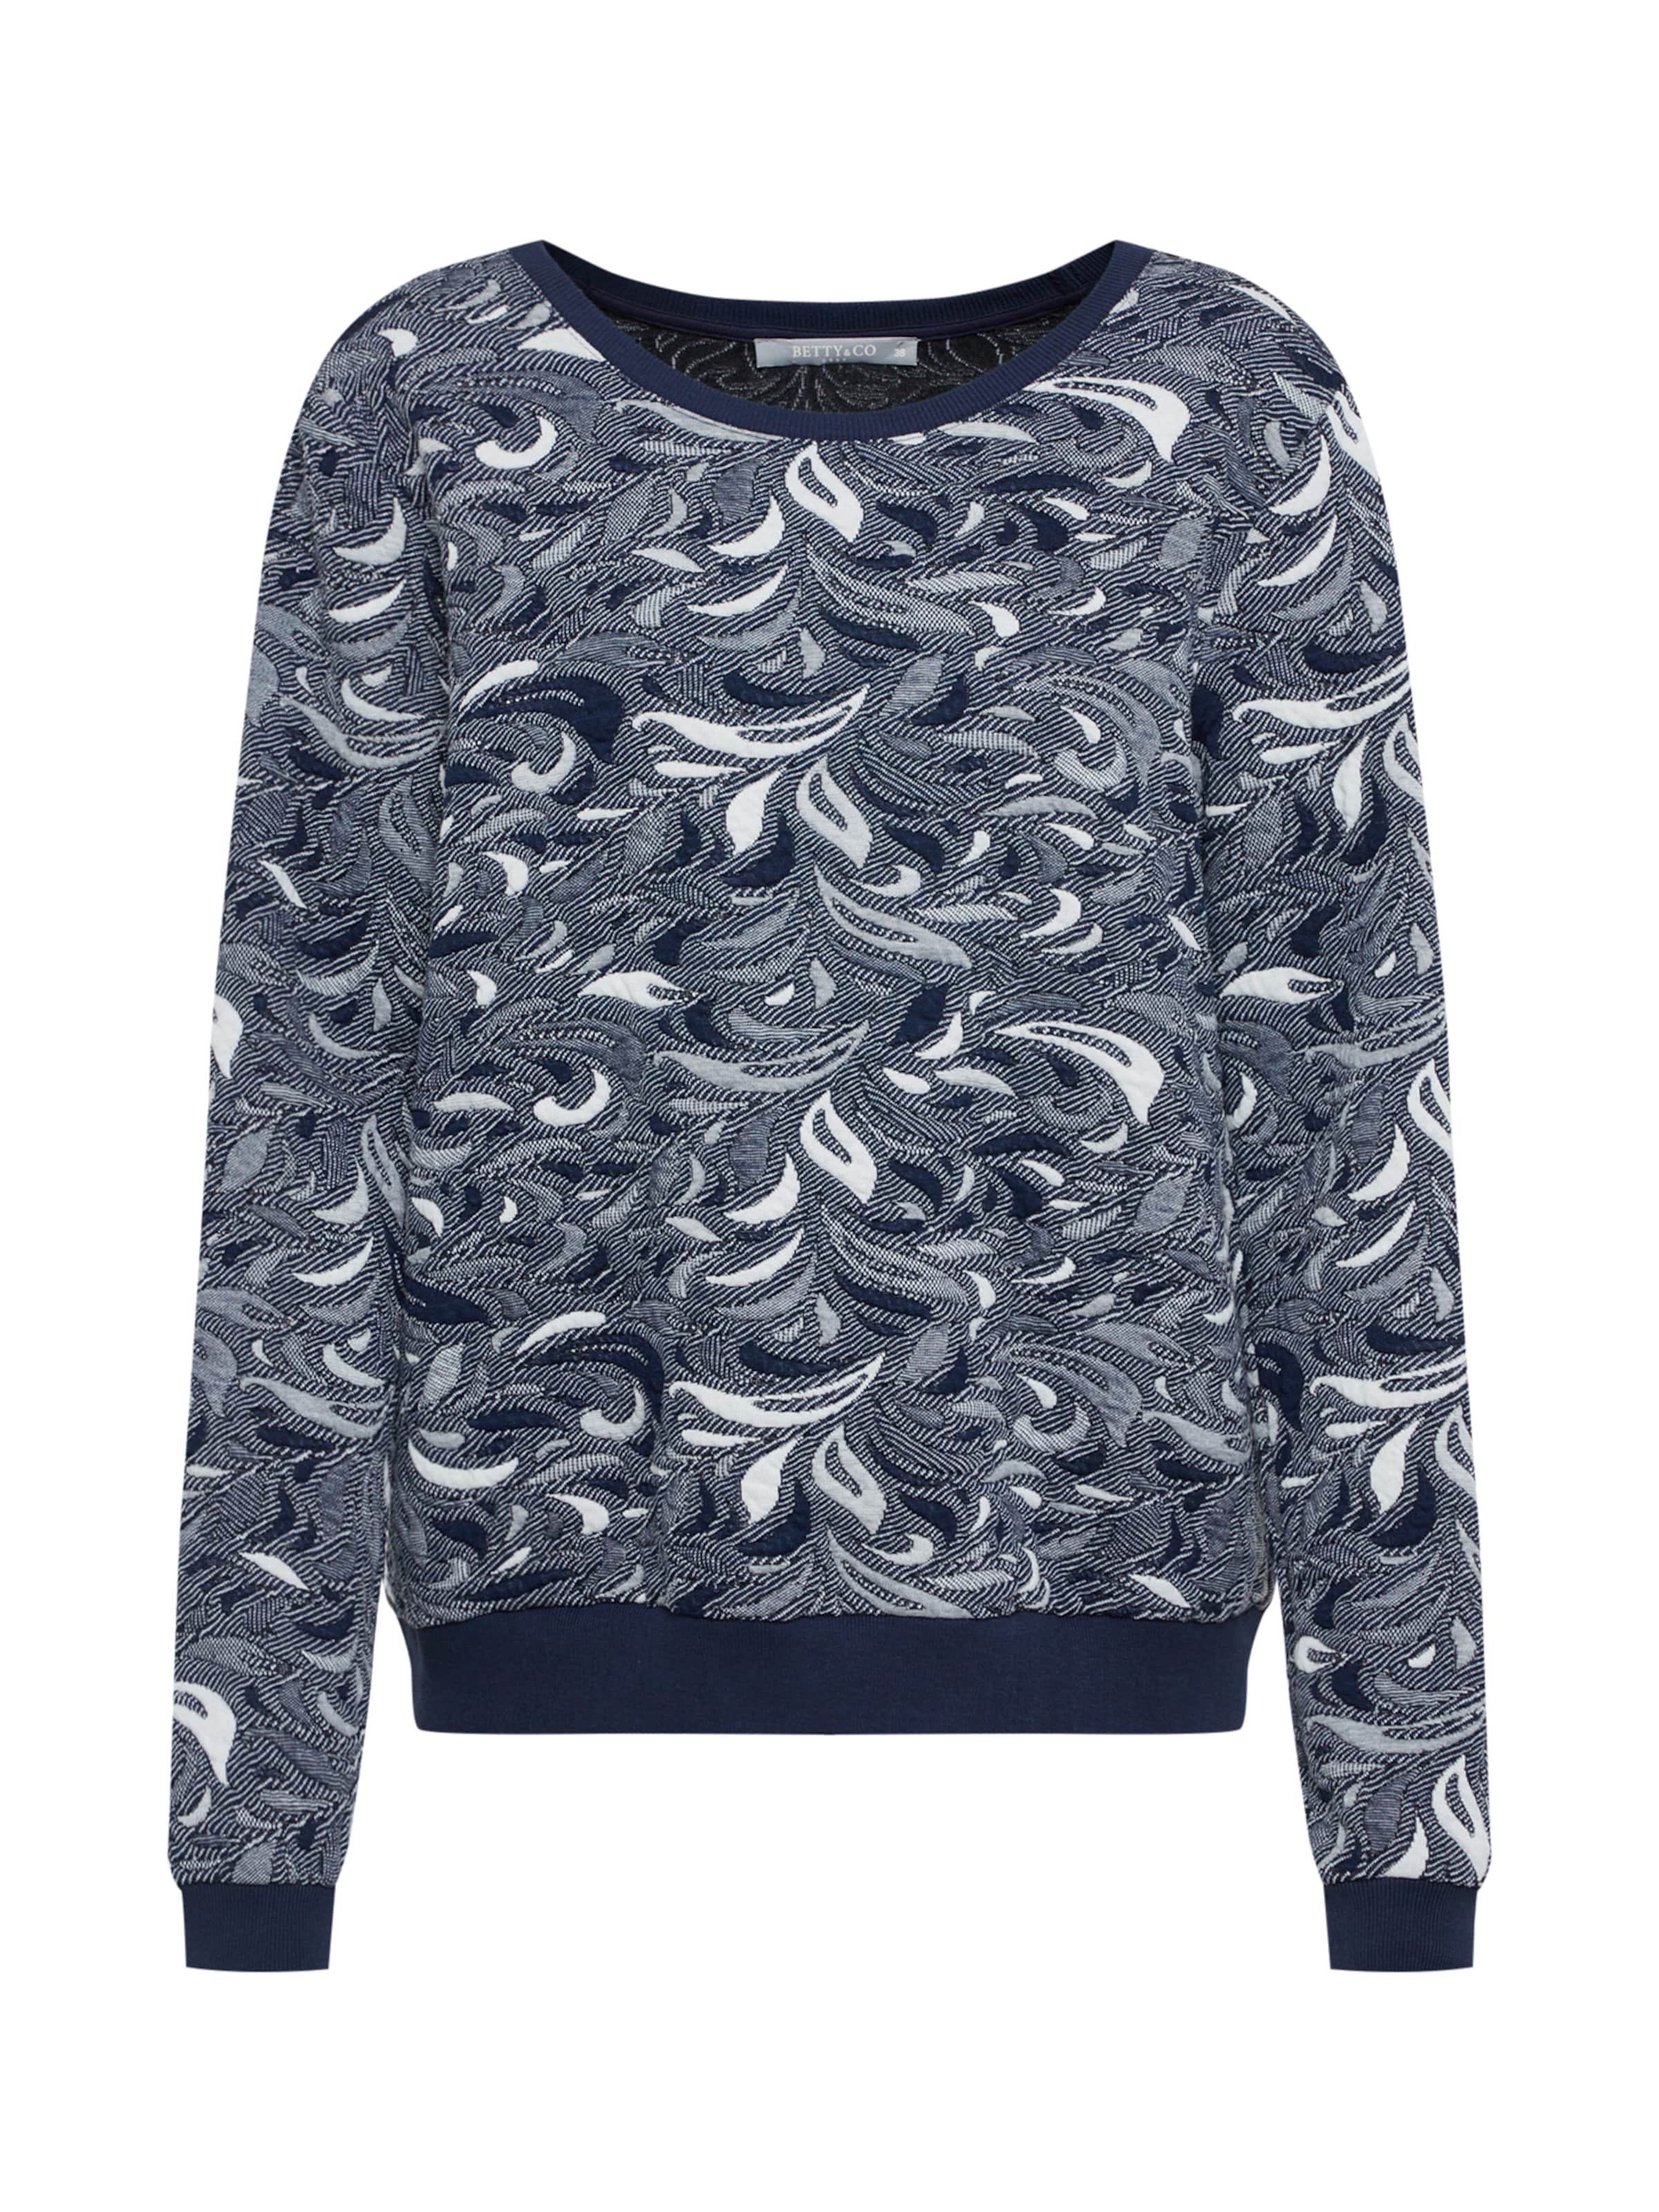 BlauGrau In Bettyamp; Sweater BlauGrau Bettyamp; Co Co In Bettyamp; Co Sweater EbHeWIYD29